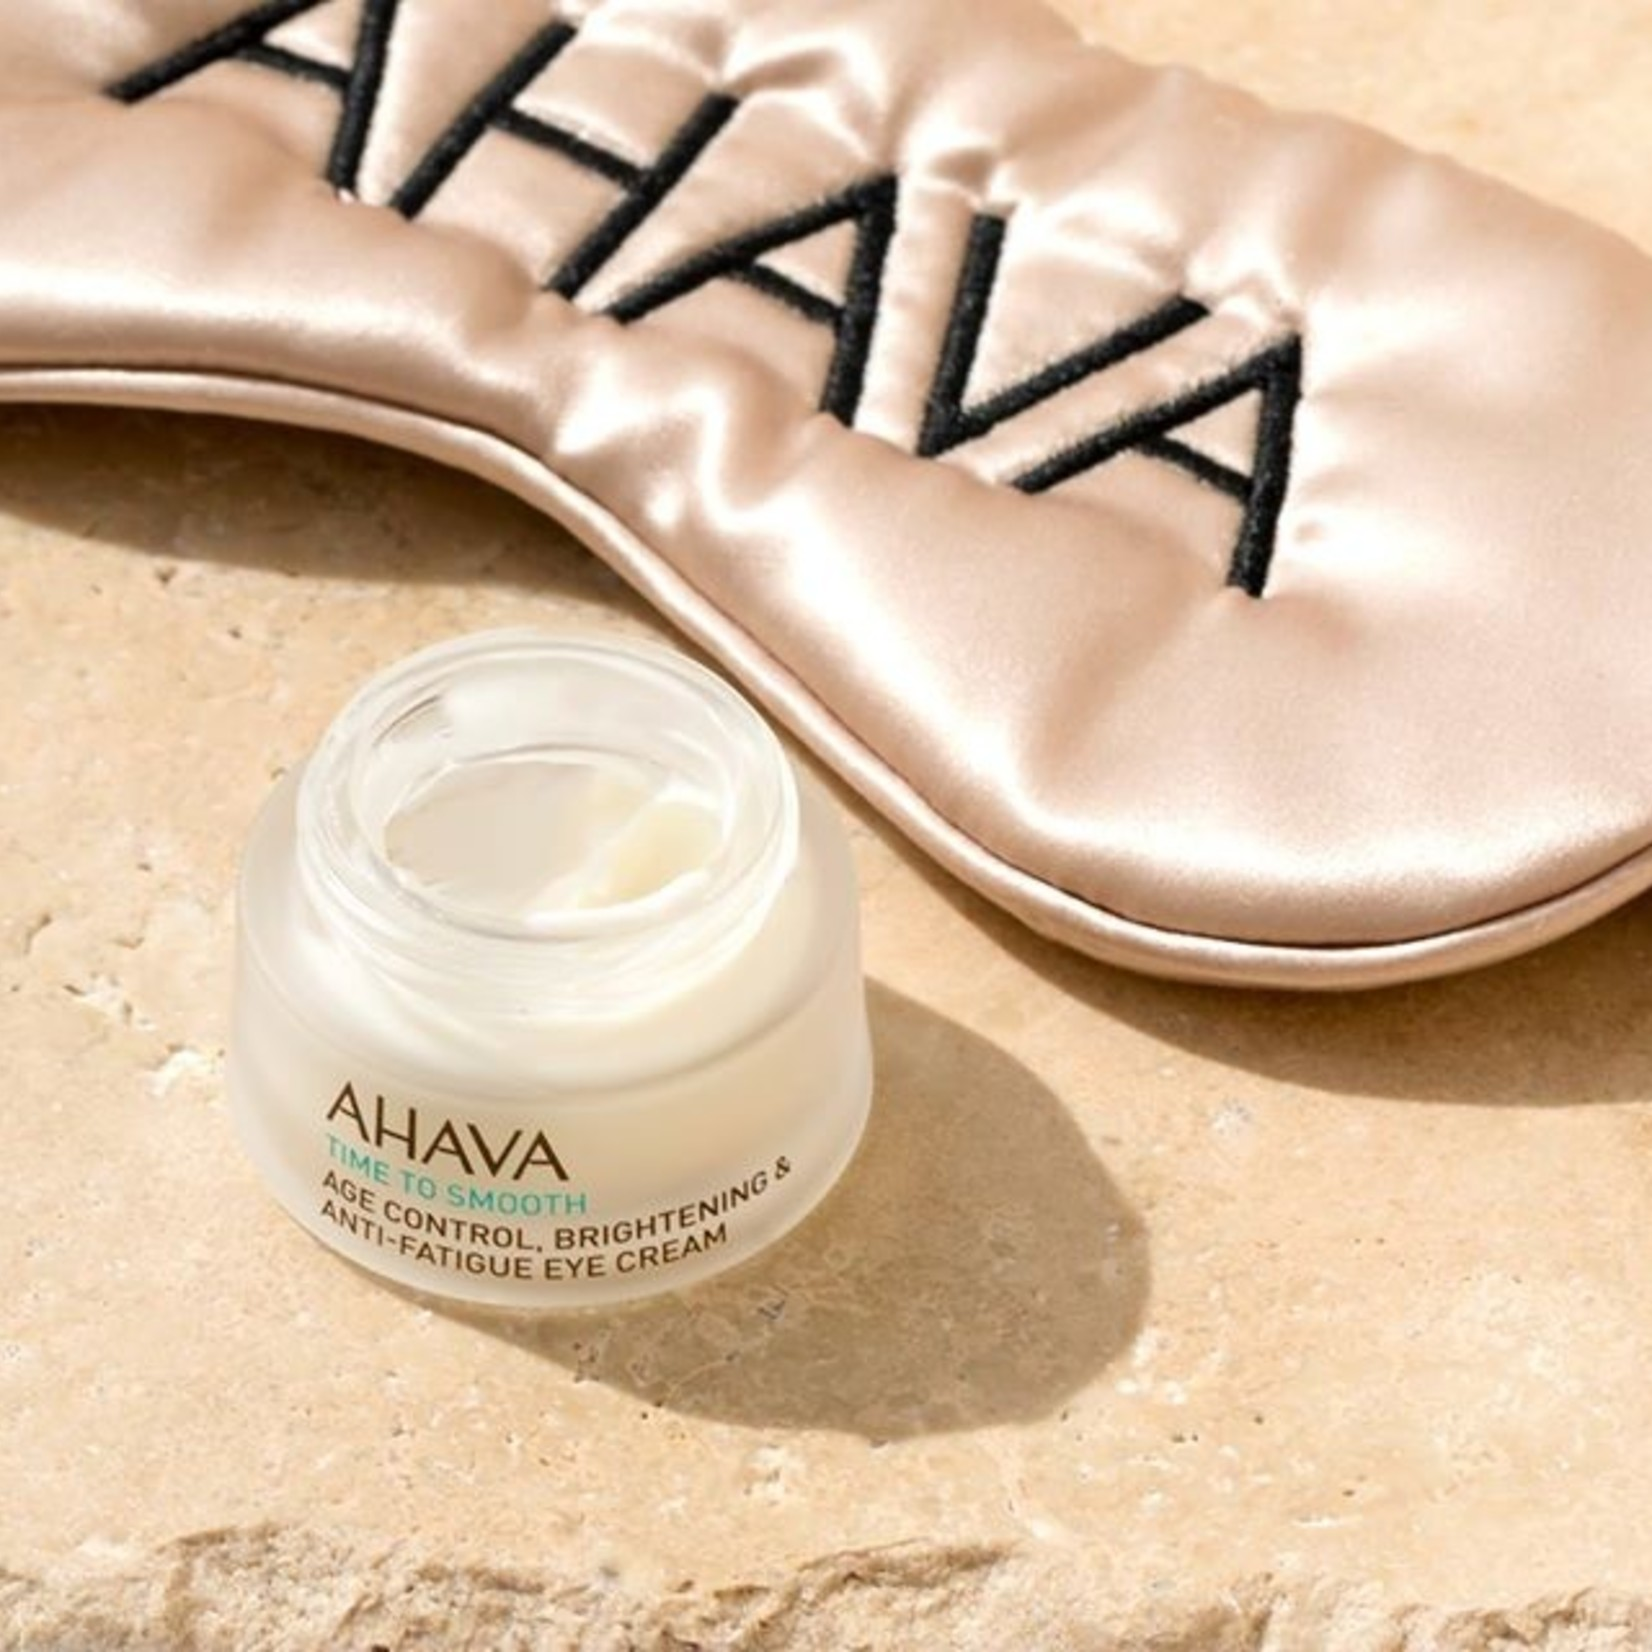 AHAVA Age control even tone & anti-fatigue eye cream 15ml